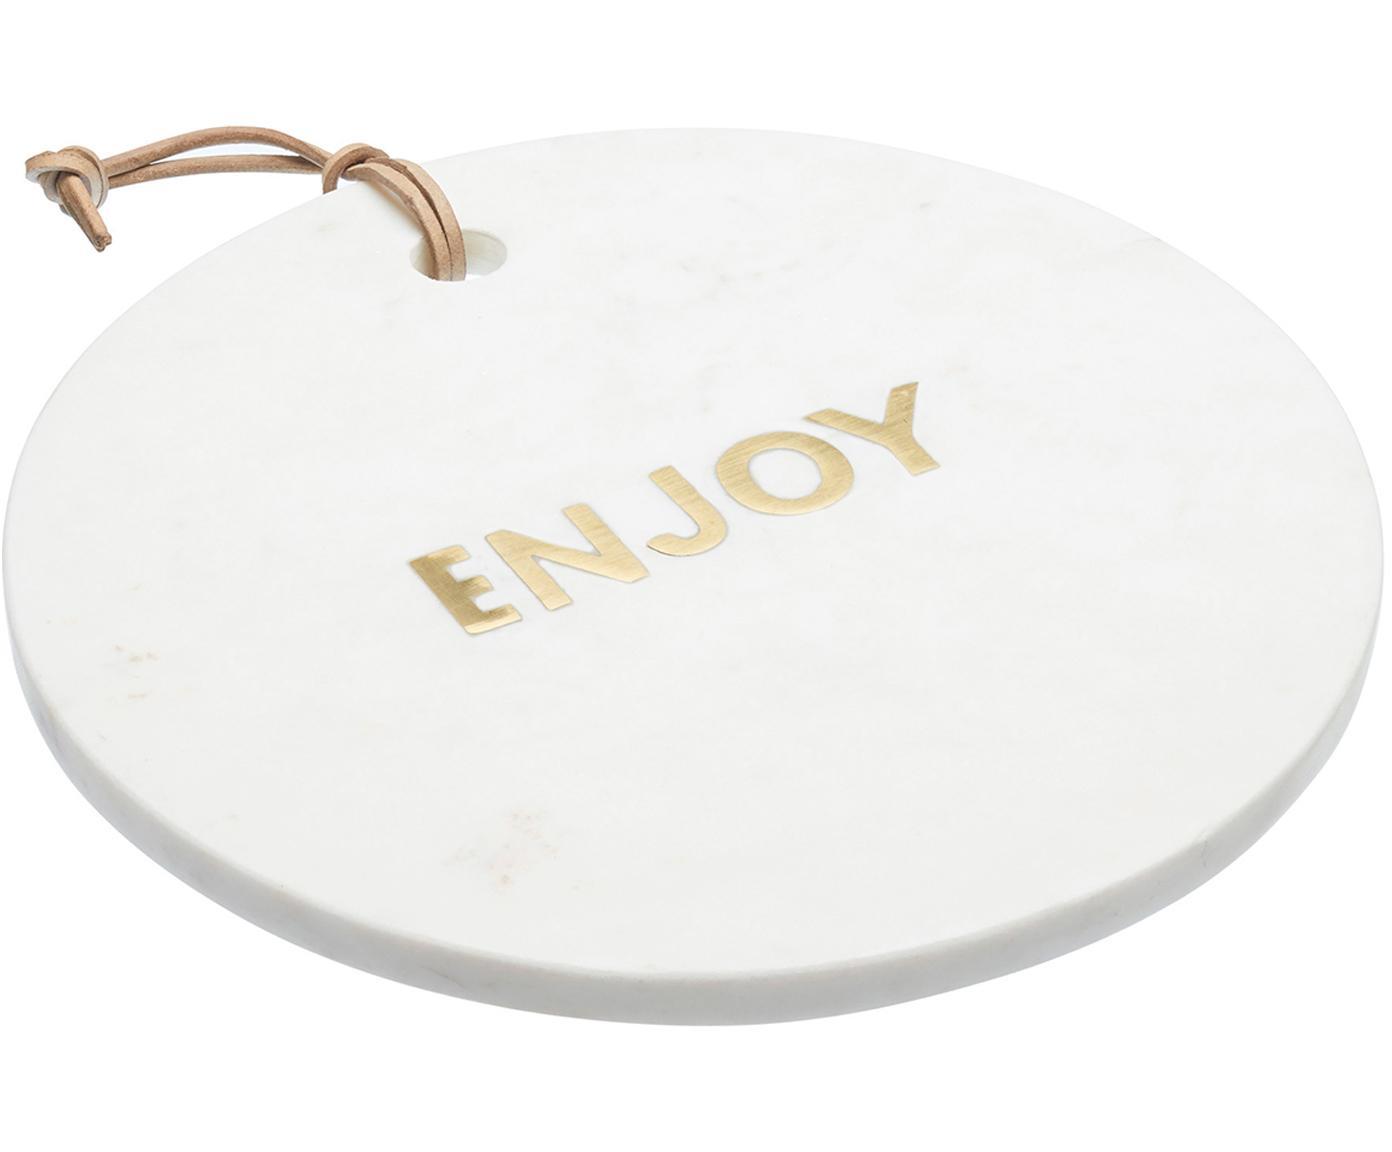 Marmor-Servierbrett Artesa, Marmor, Weiß, Goldfarben, Ø 26 cm